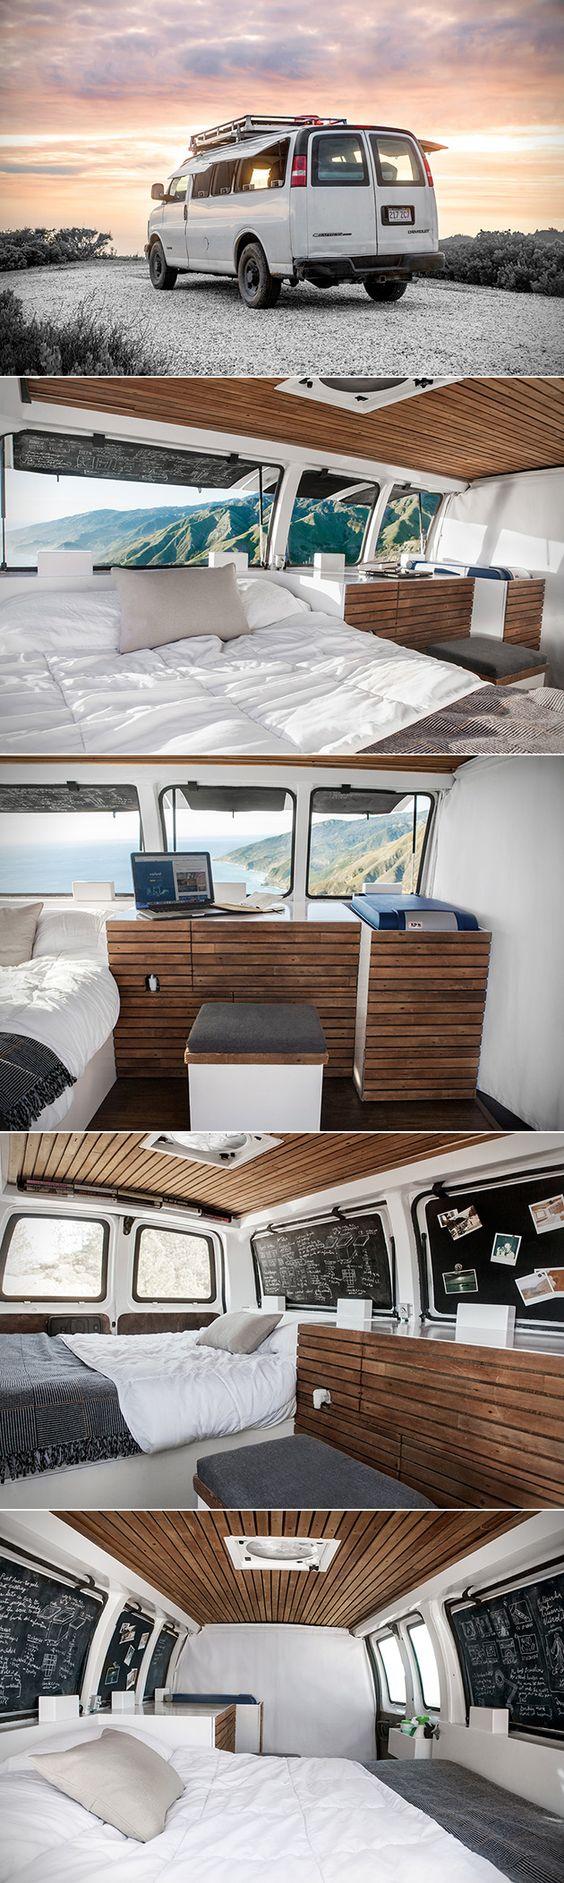 dream-interior-van-3.jpg